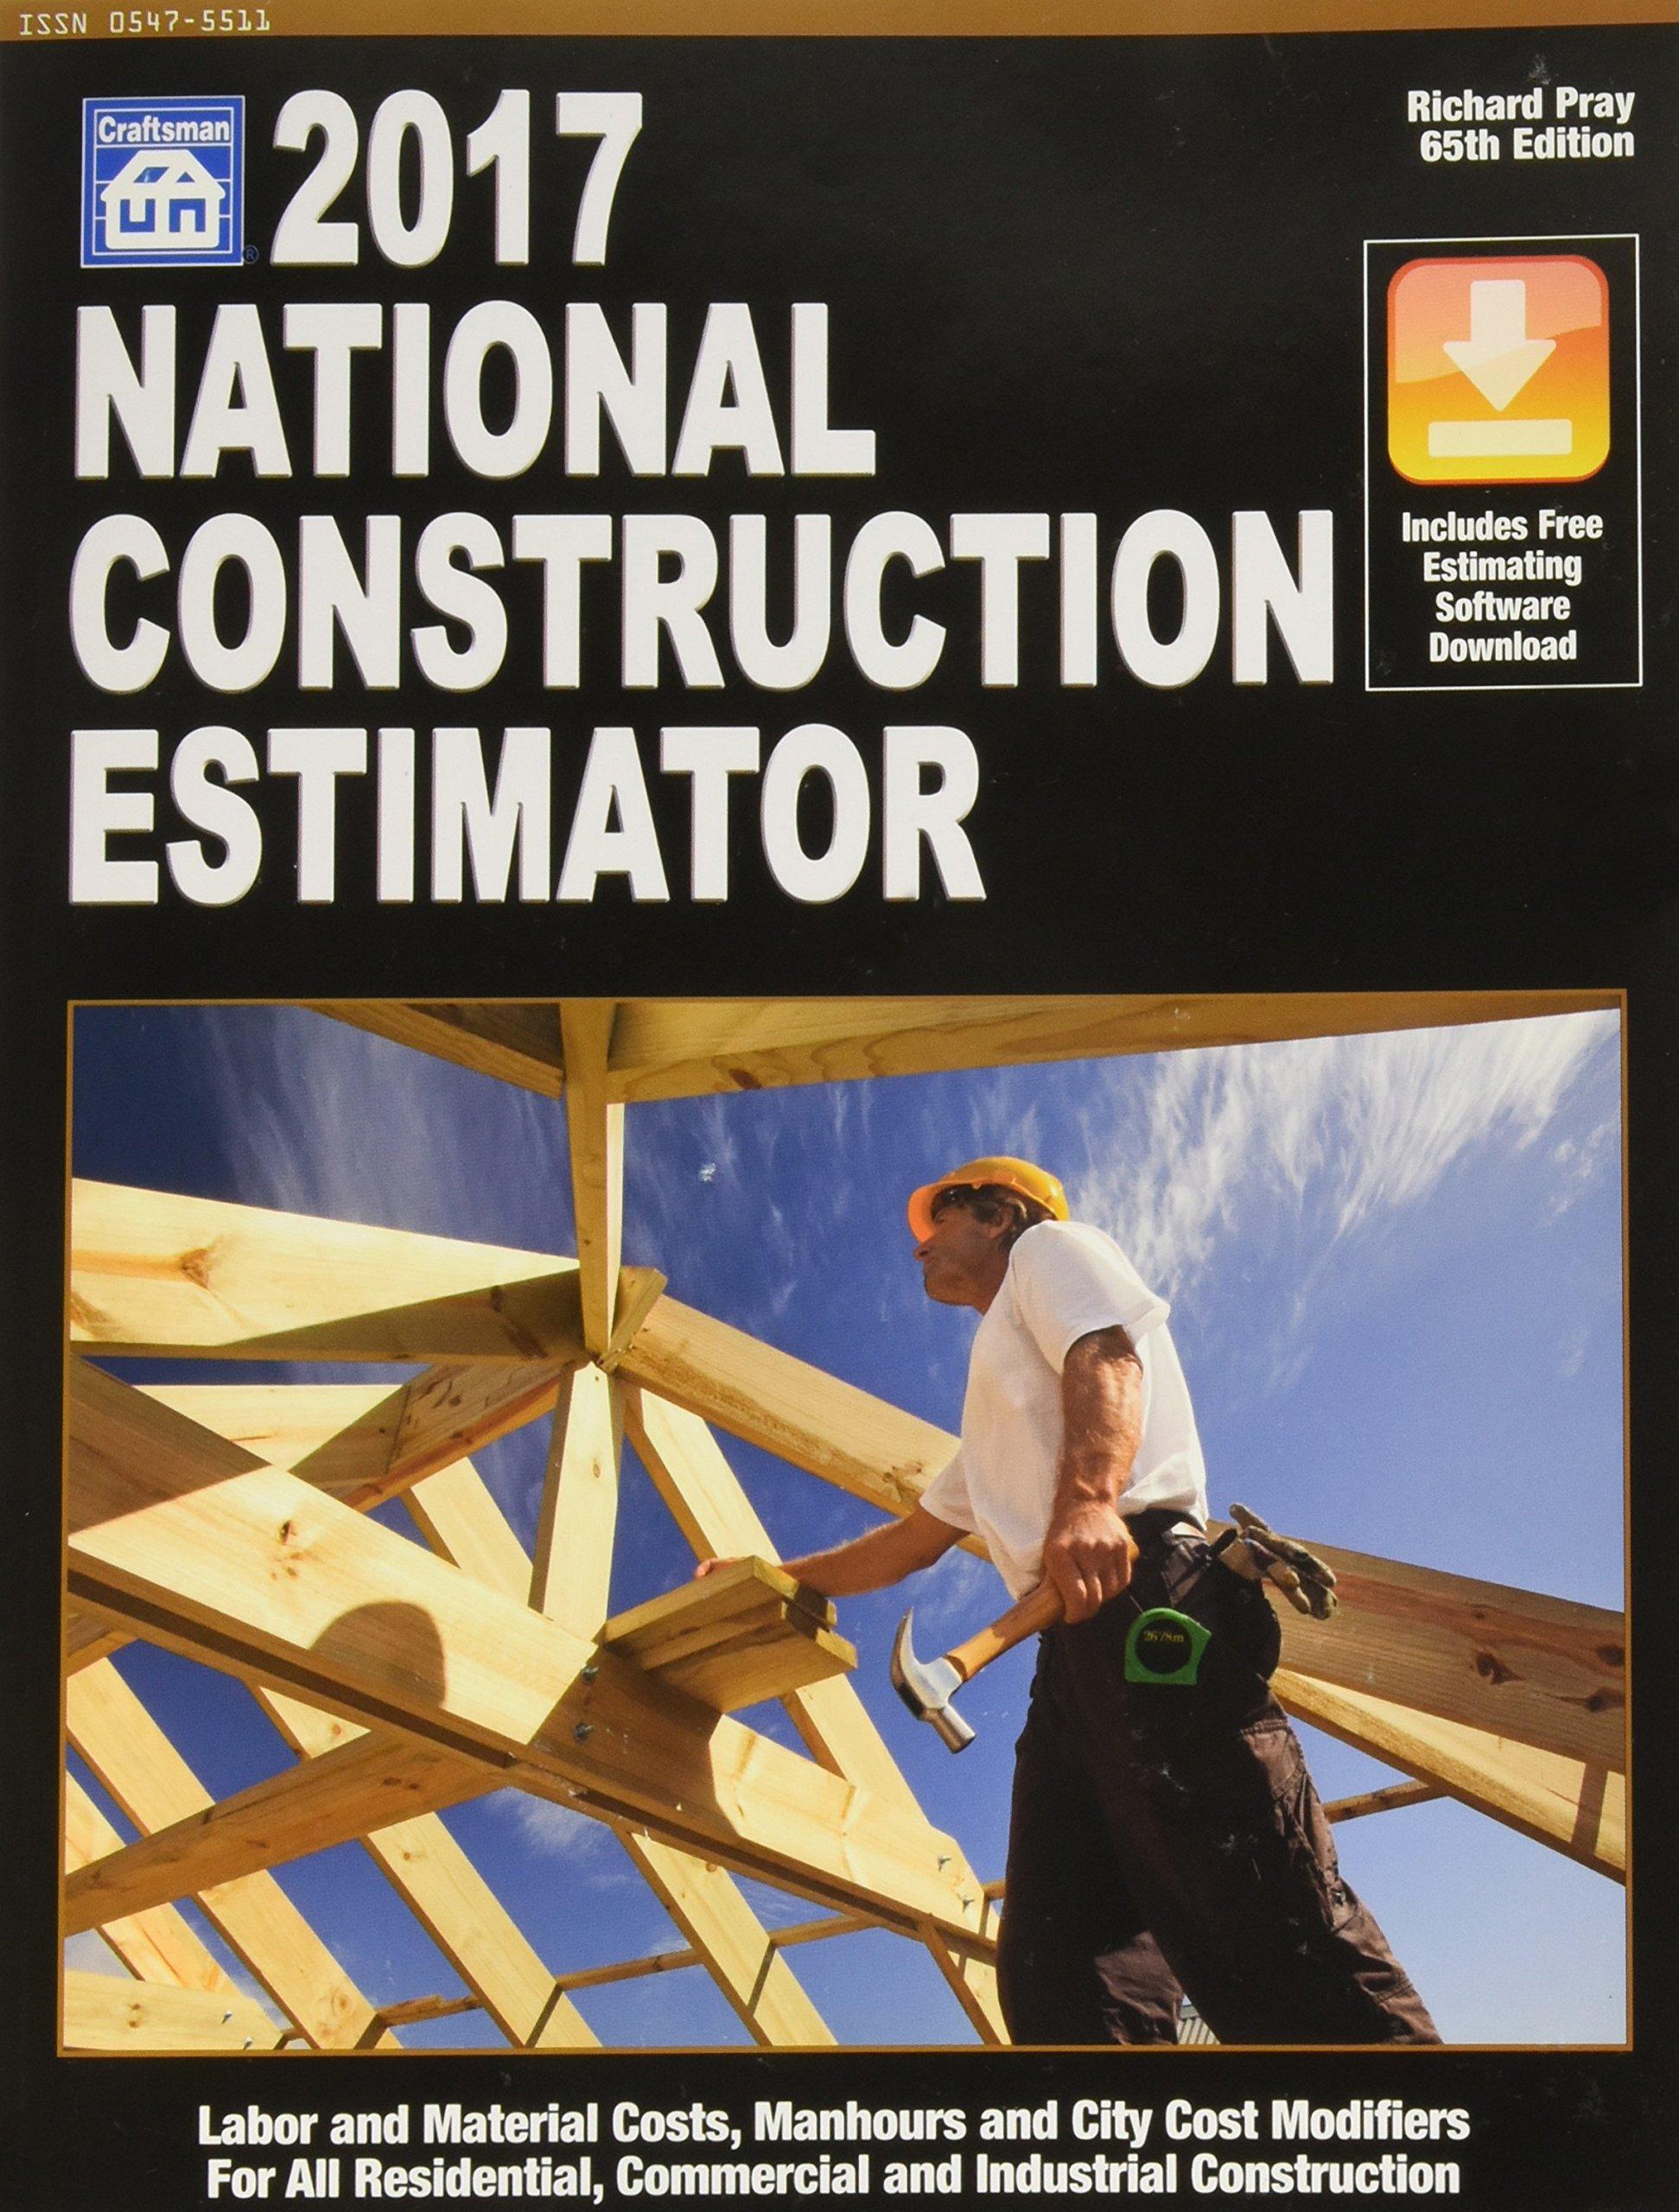 National Construction Estimator 2017 (Craftsmen)